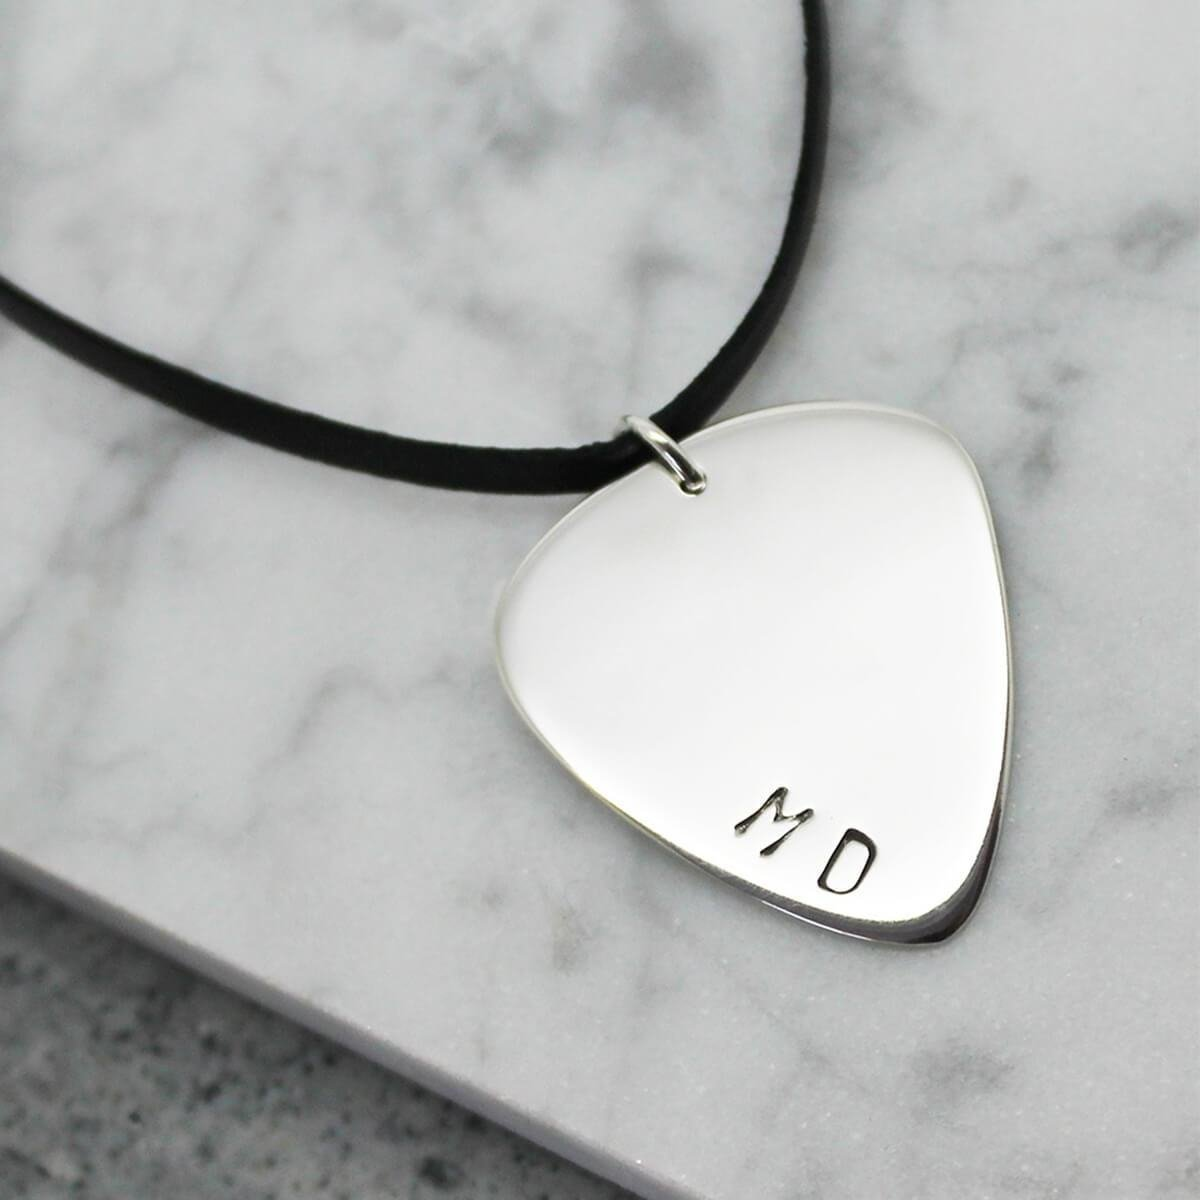 Personalised Guitar Pick Sterling Silver Pendant -  Hilary&June